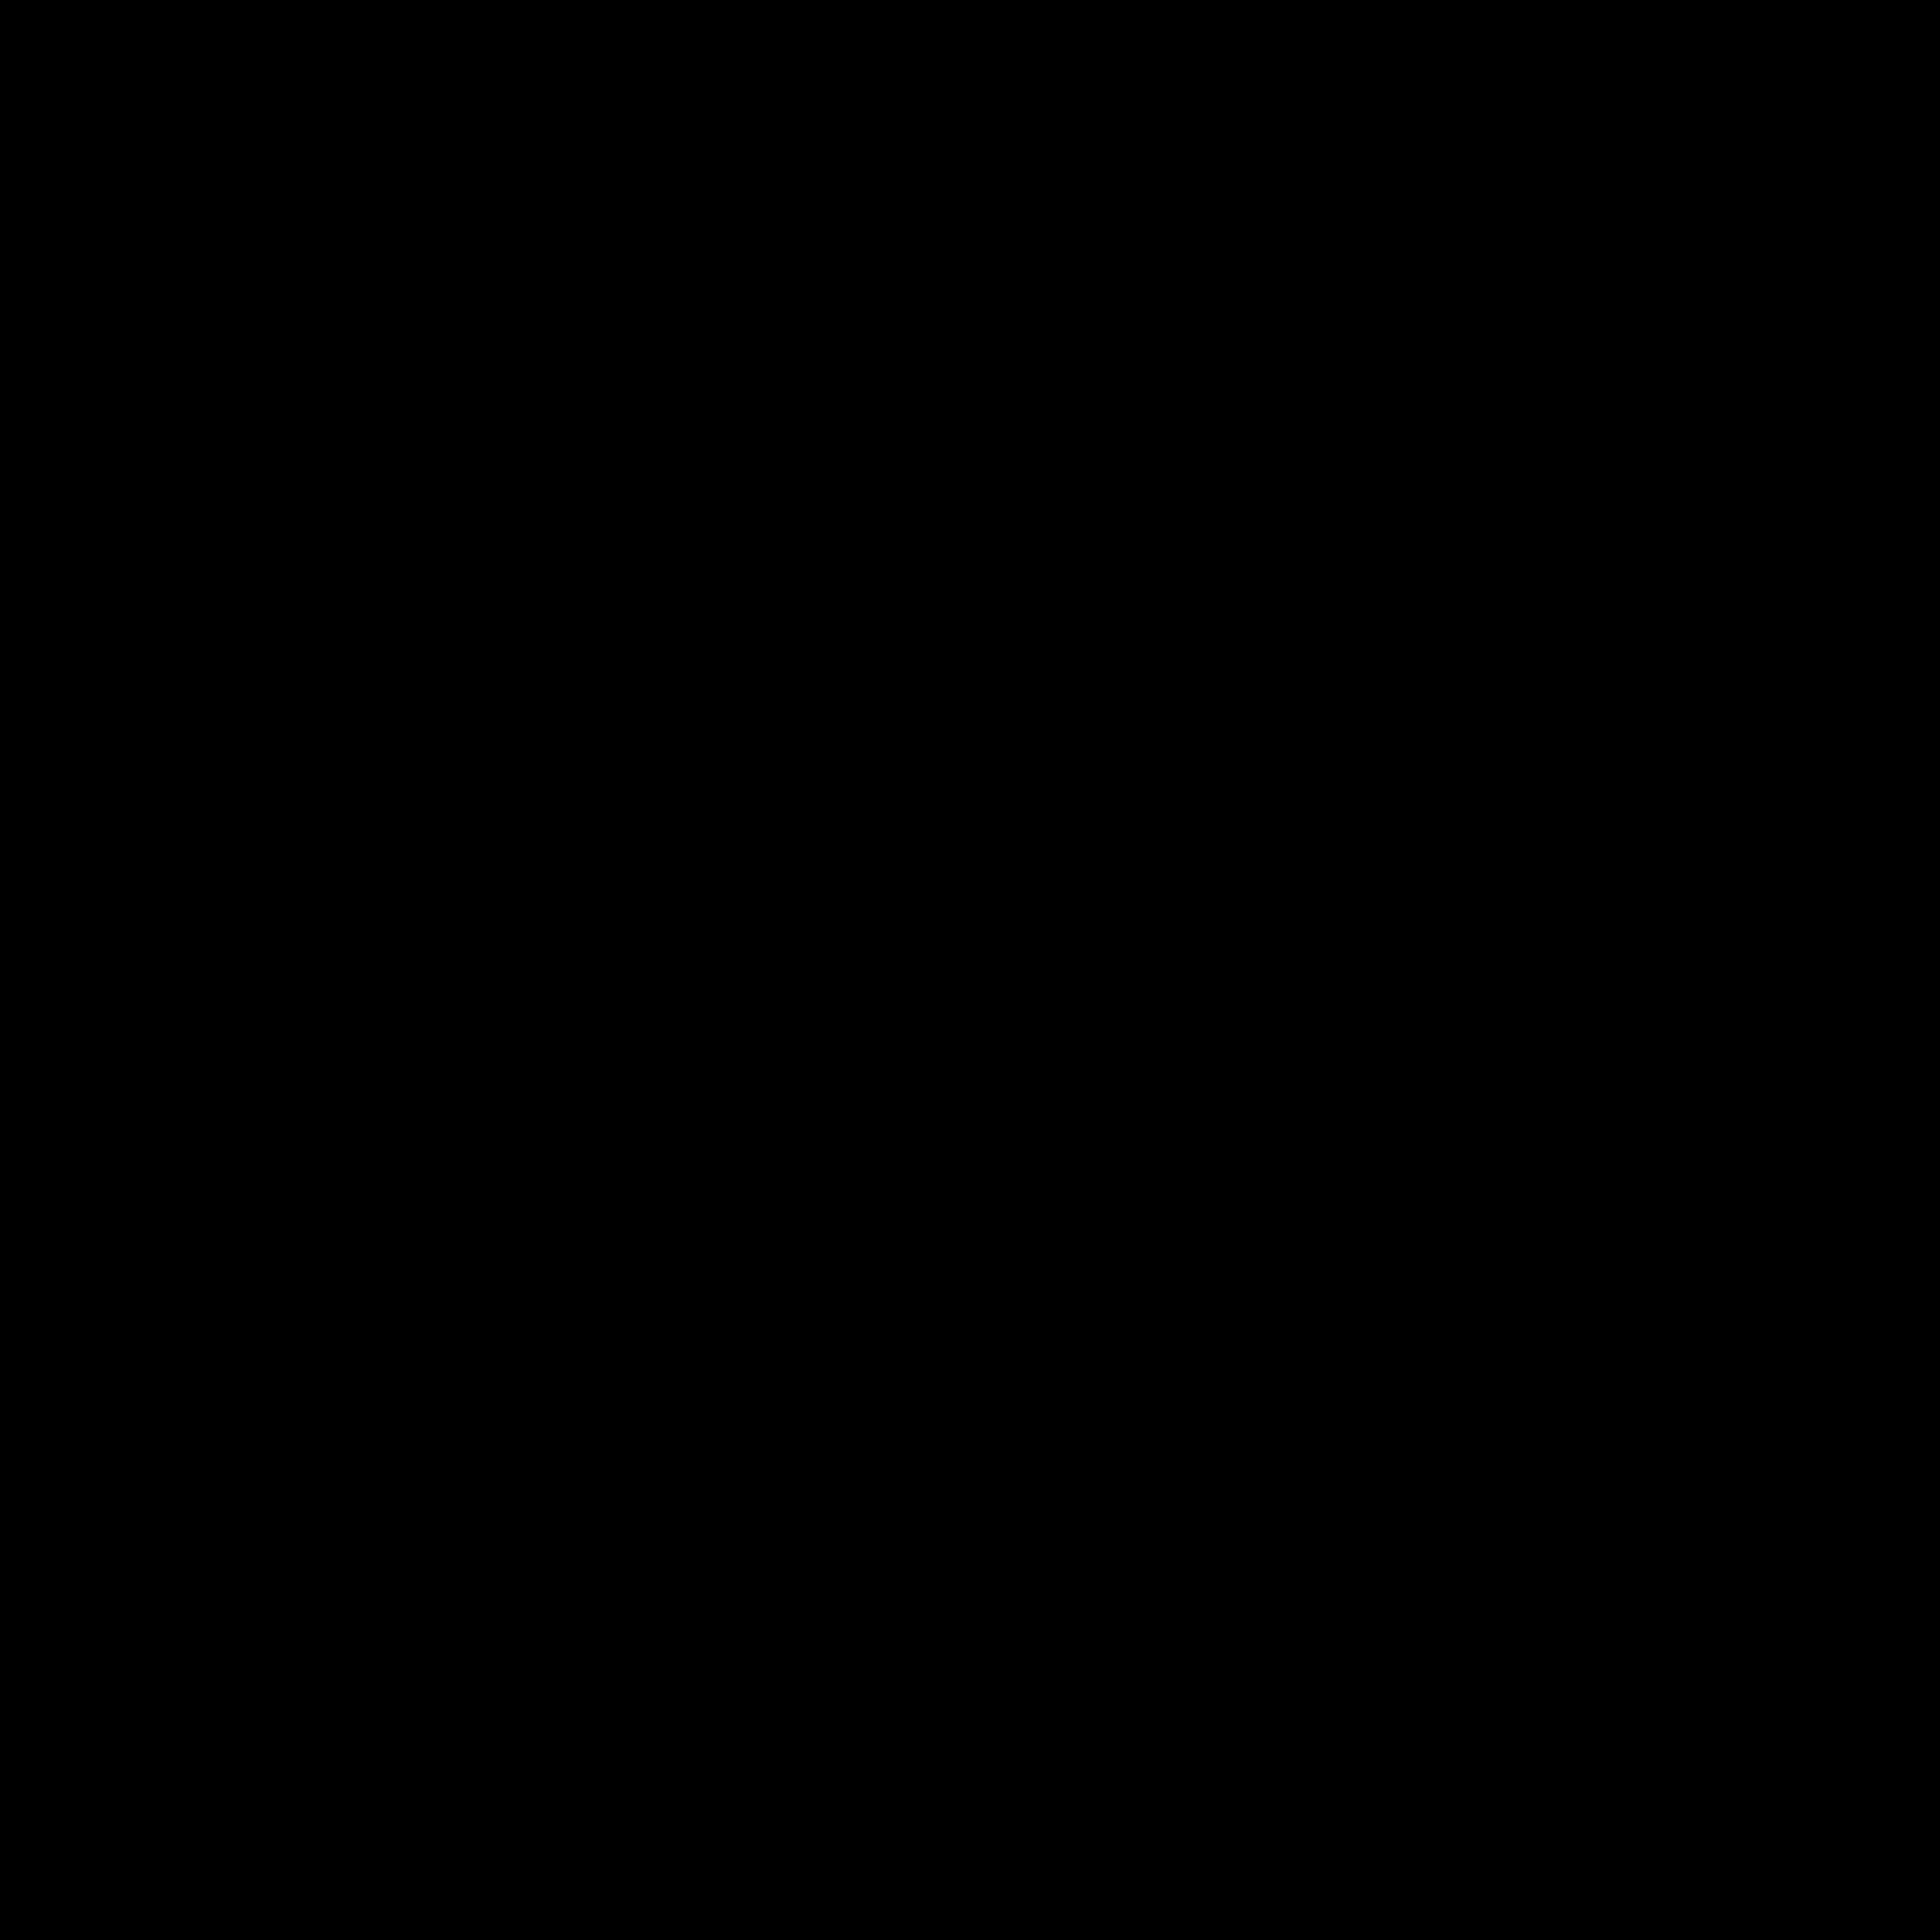 2294x2294 Dark Sun Icons Png